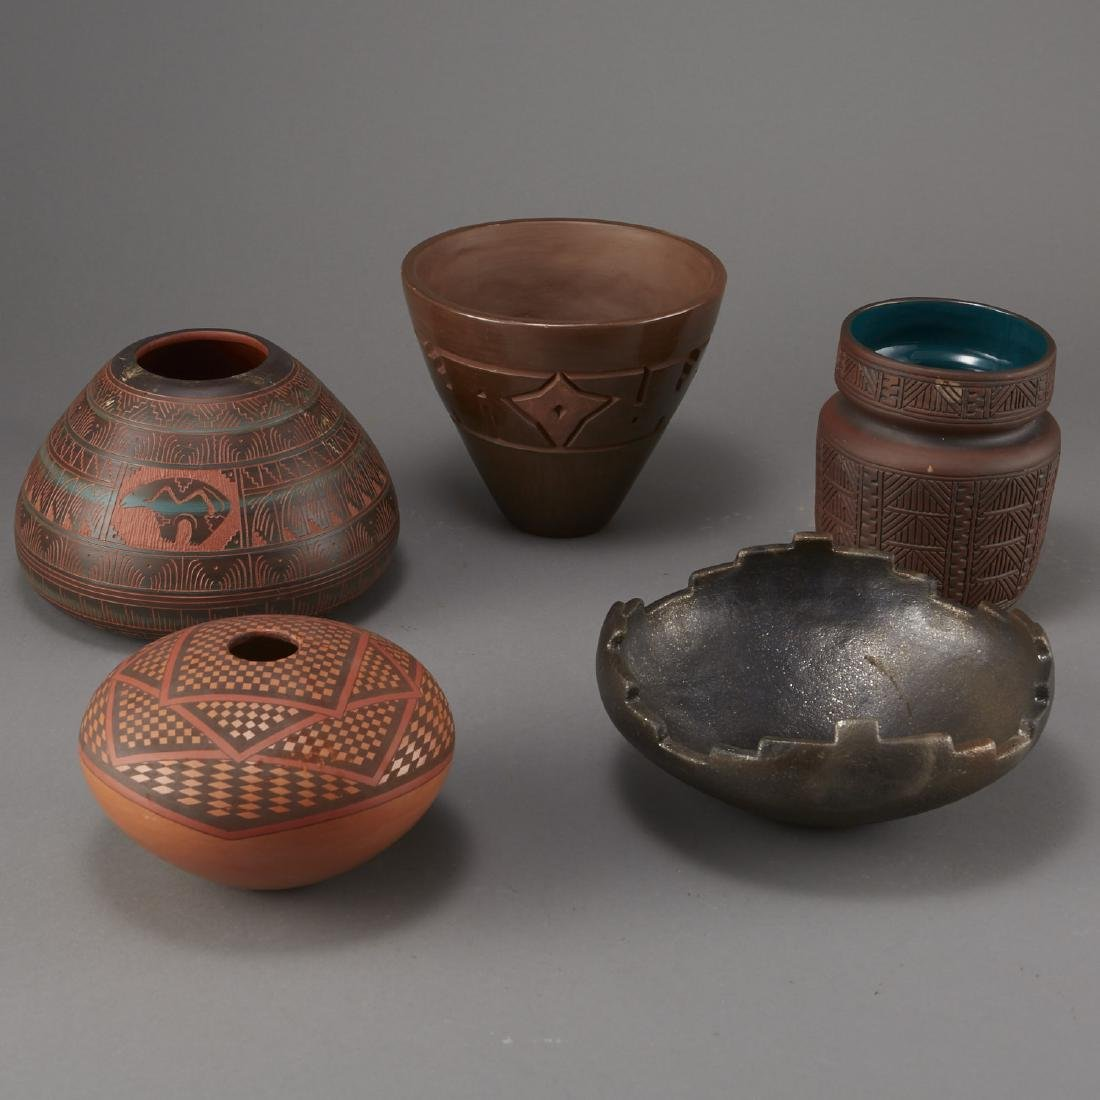 5 Pieces of Native American Pottery Sheldon Nunez - 2